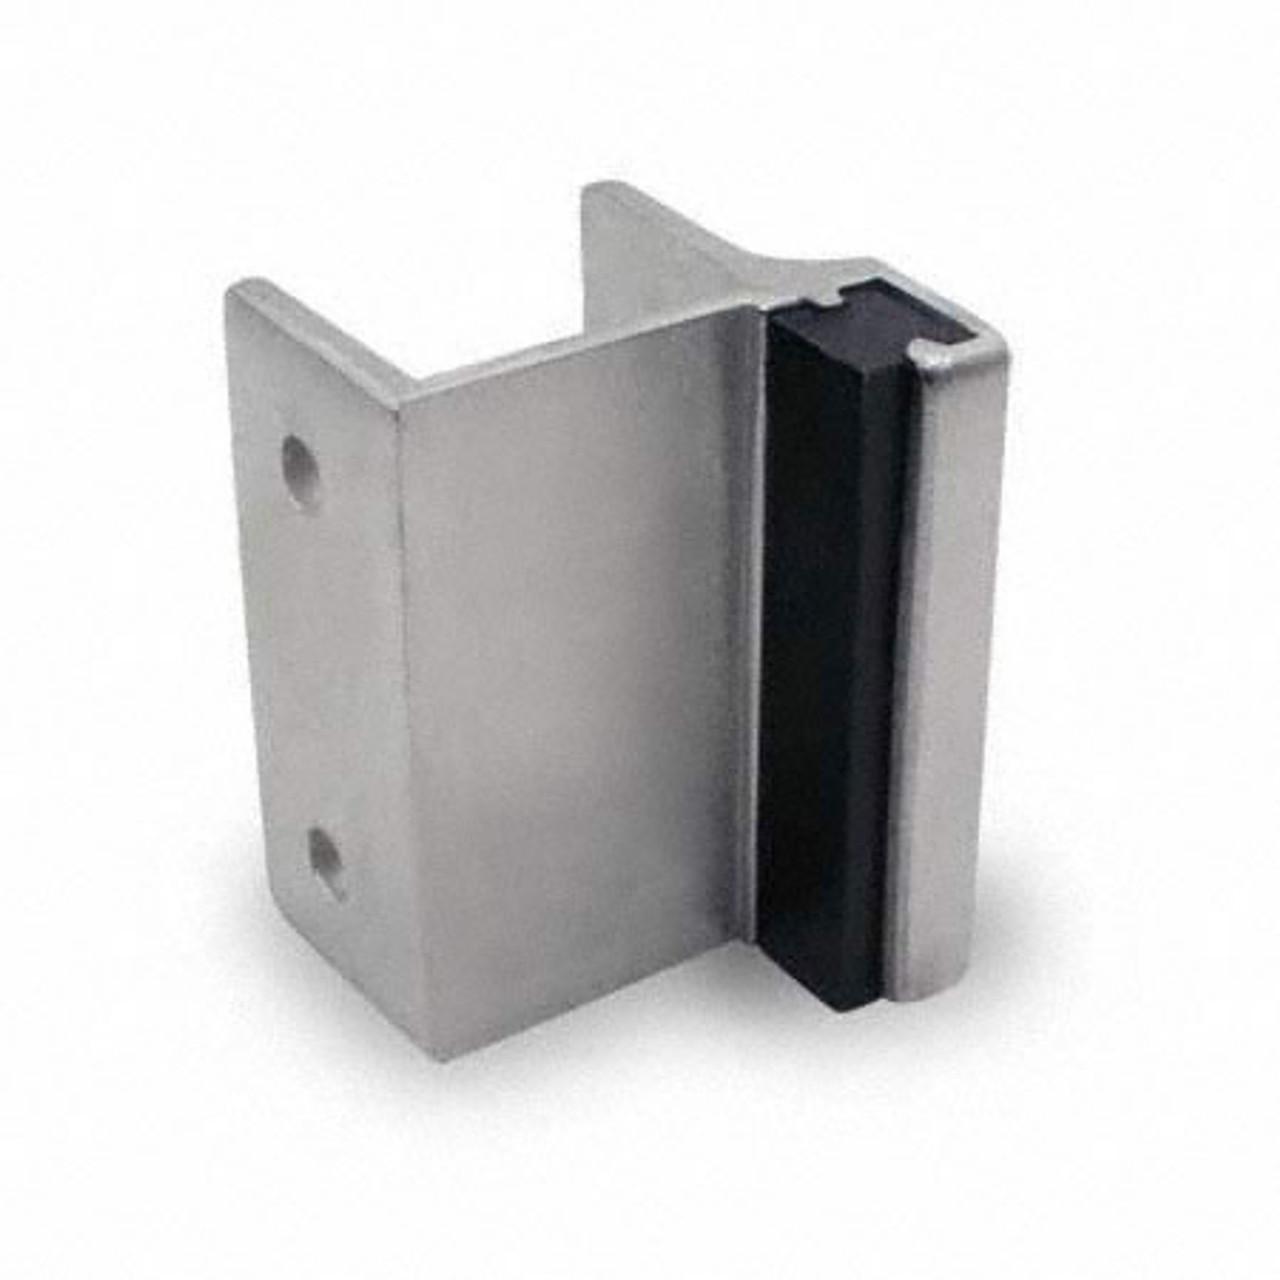 Outswing Aluminum Keeper (2060-OAL)